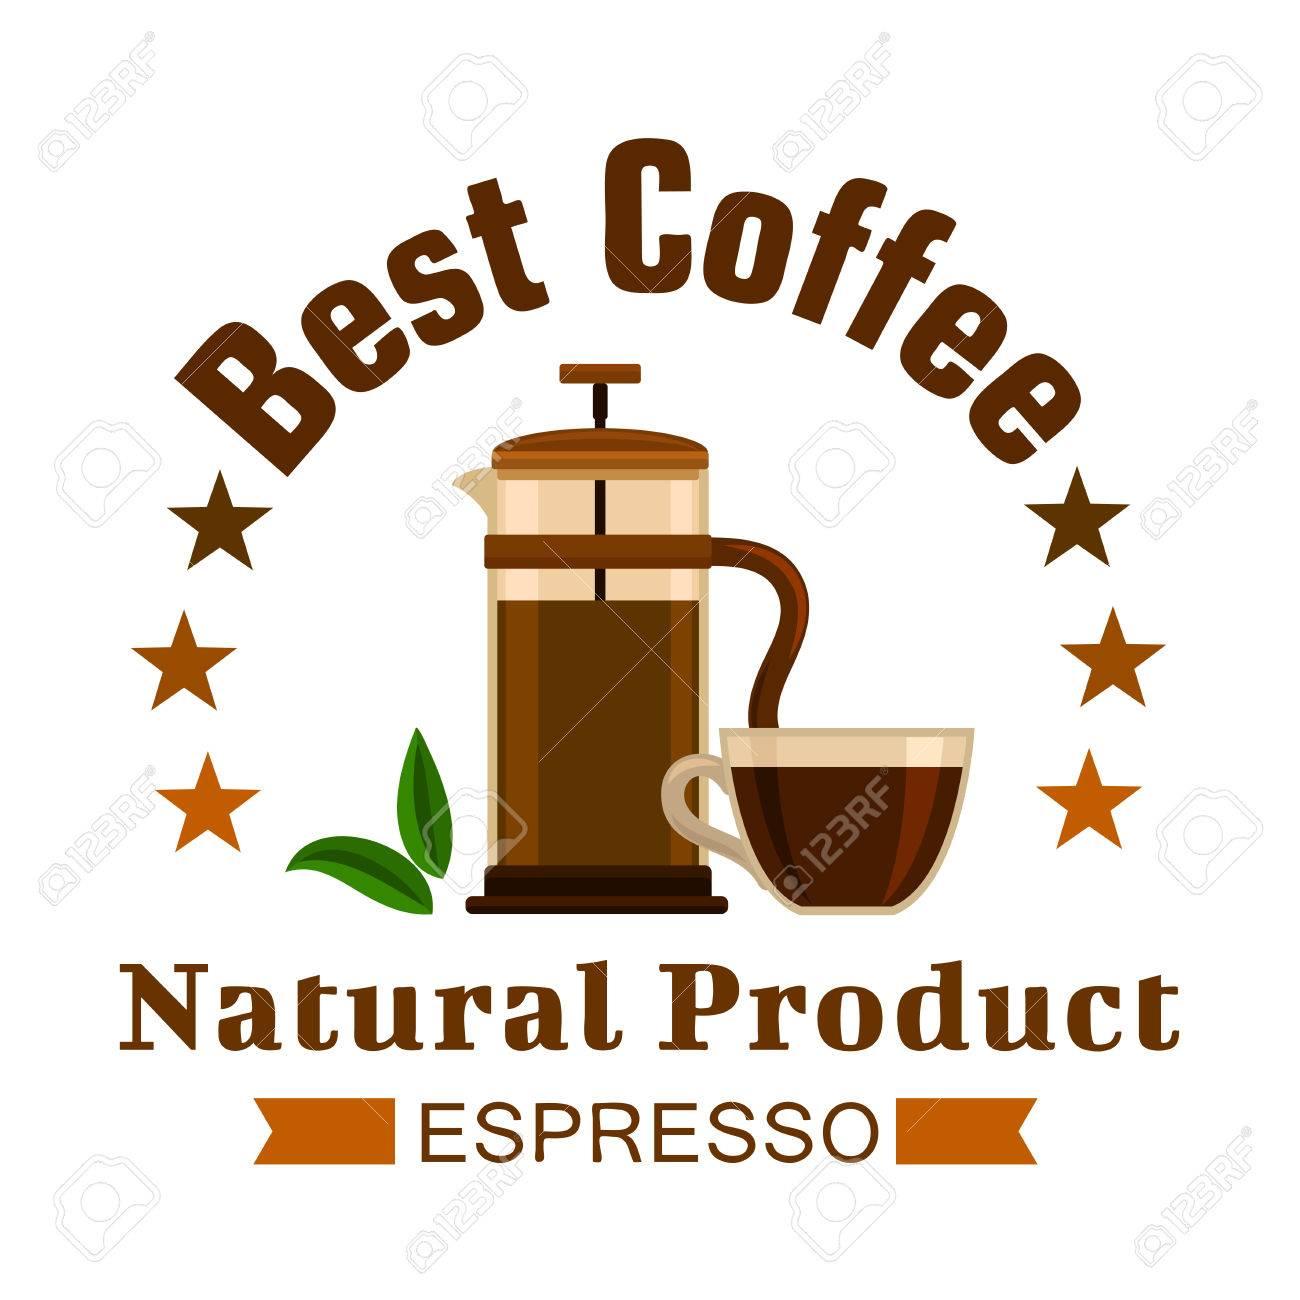 Emblema De Café. Etiqueta De Café Expreso. Cafetera Fritas Elementos ...